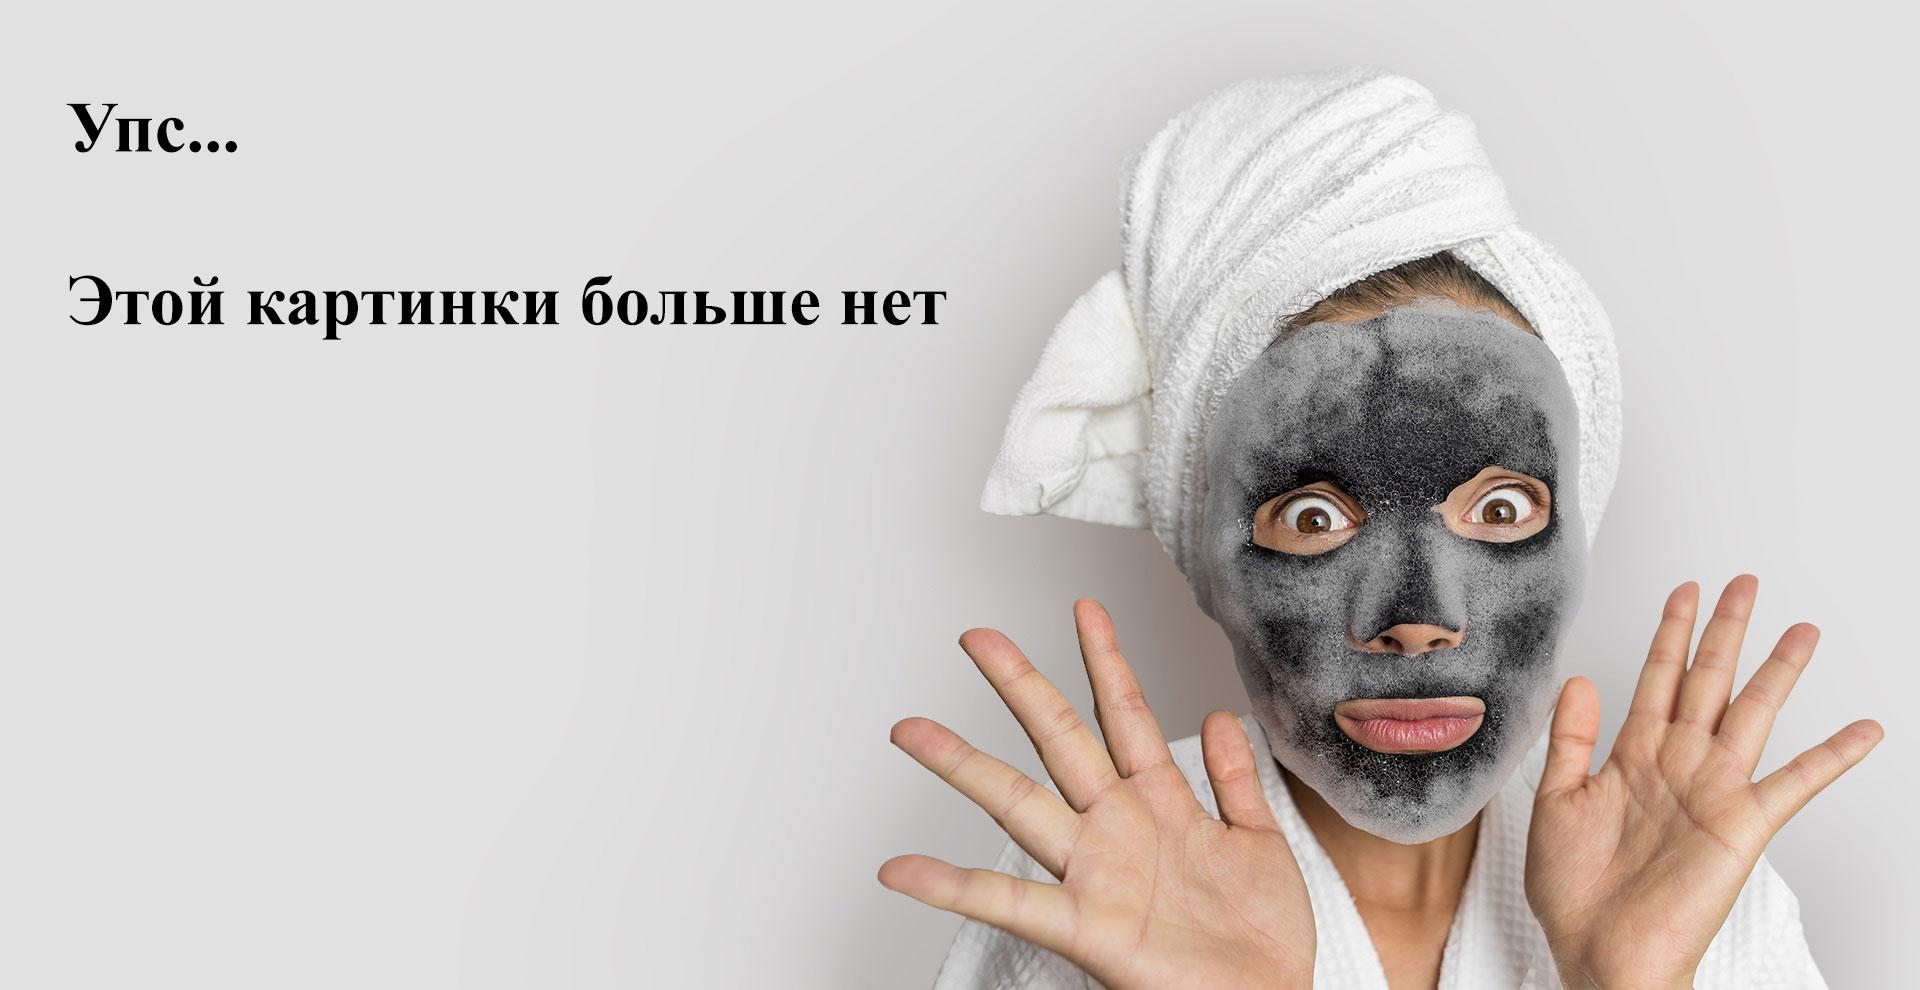 Нolika Holika, Пенка для лица глубоко очищающая Soda Pore Tok Tok, 150 мл